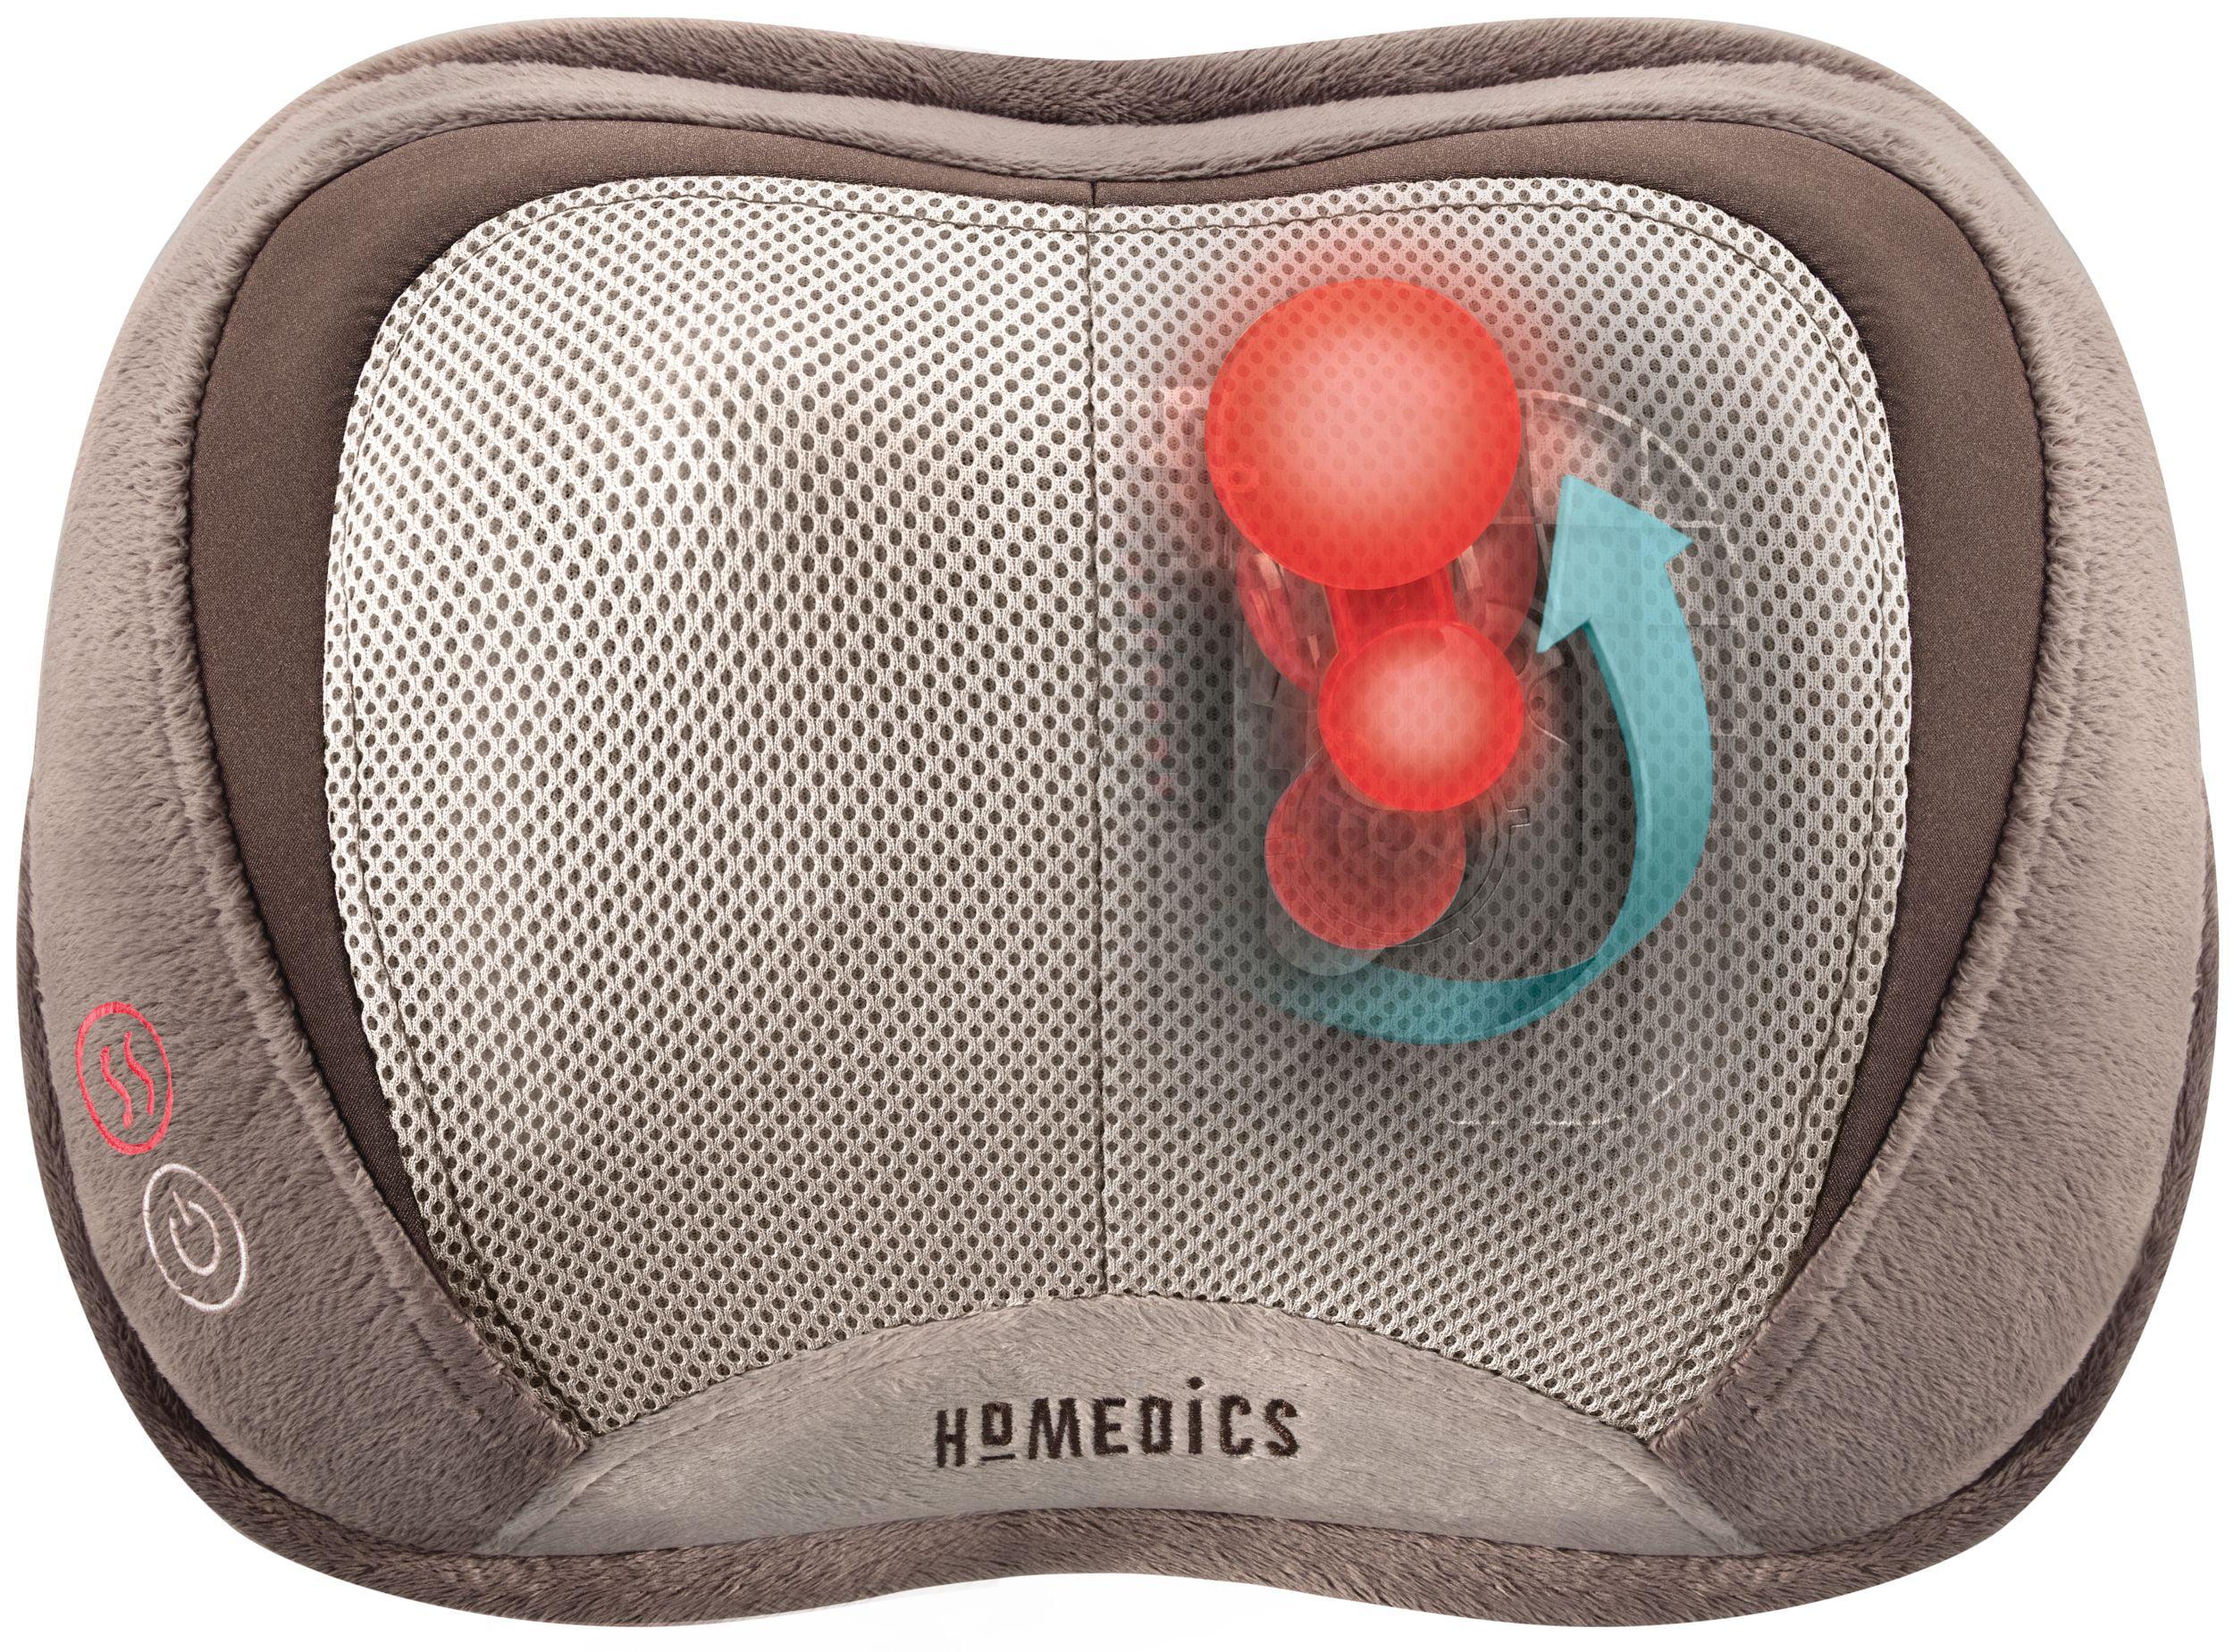 Homedics Shiatsu Elite Vibration And Massage Pillow With Heat Sp